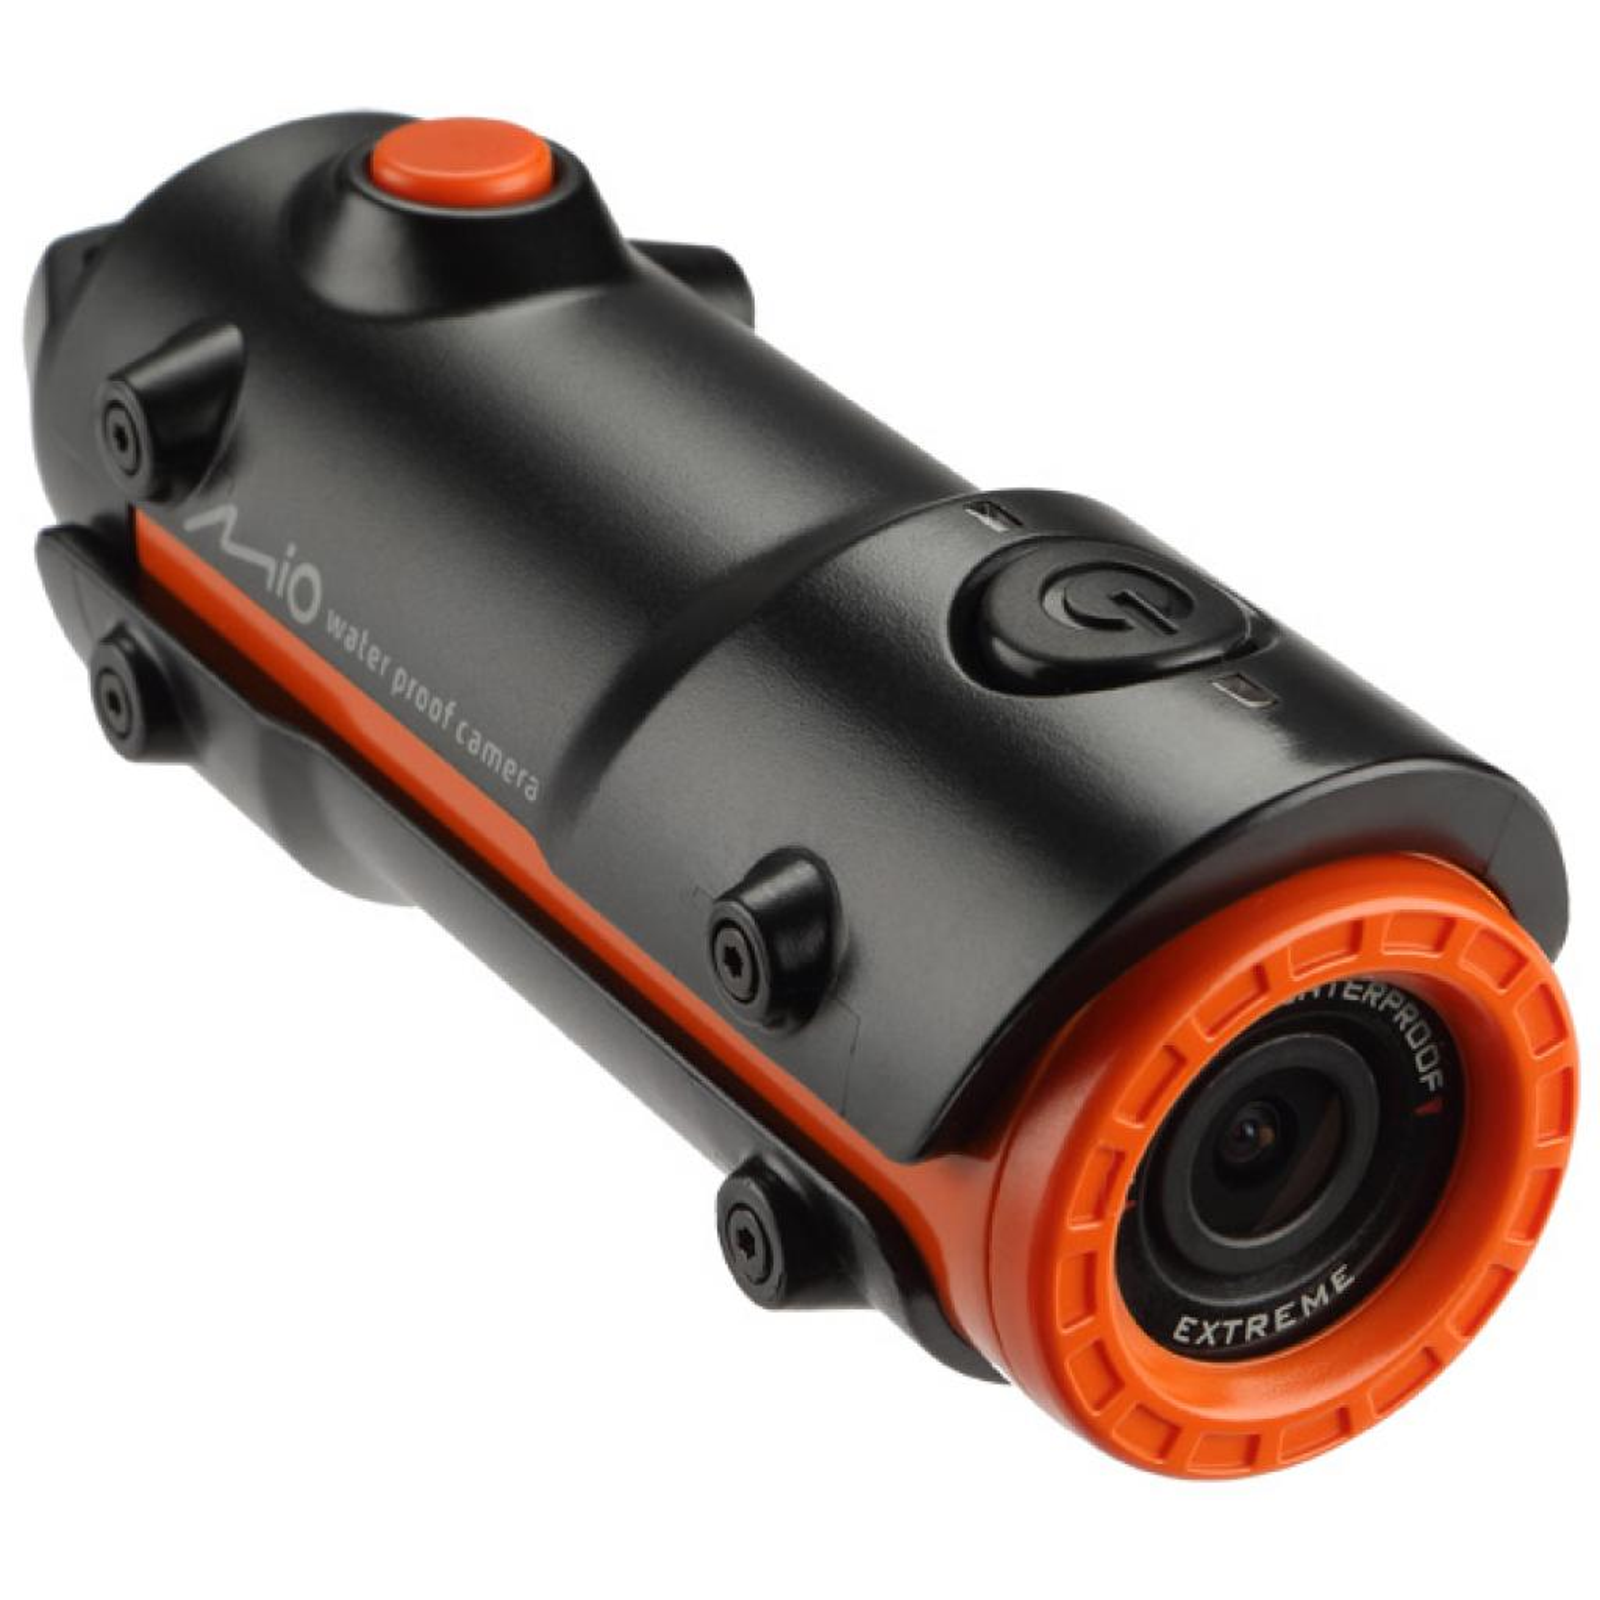 Экшн-камера MIO MiVue M300 изображение 2